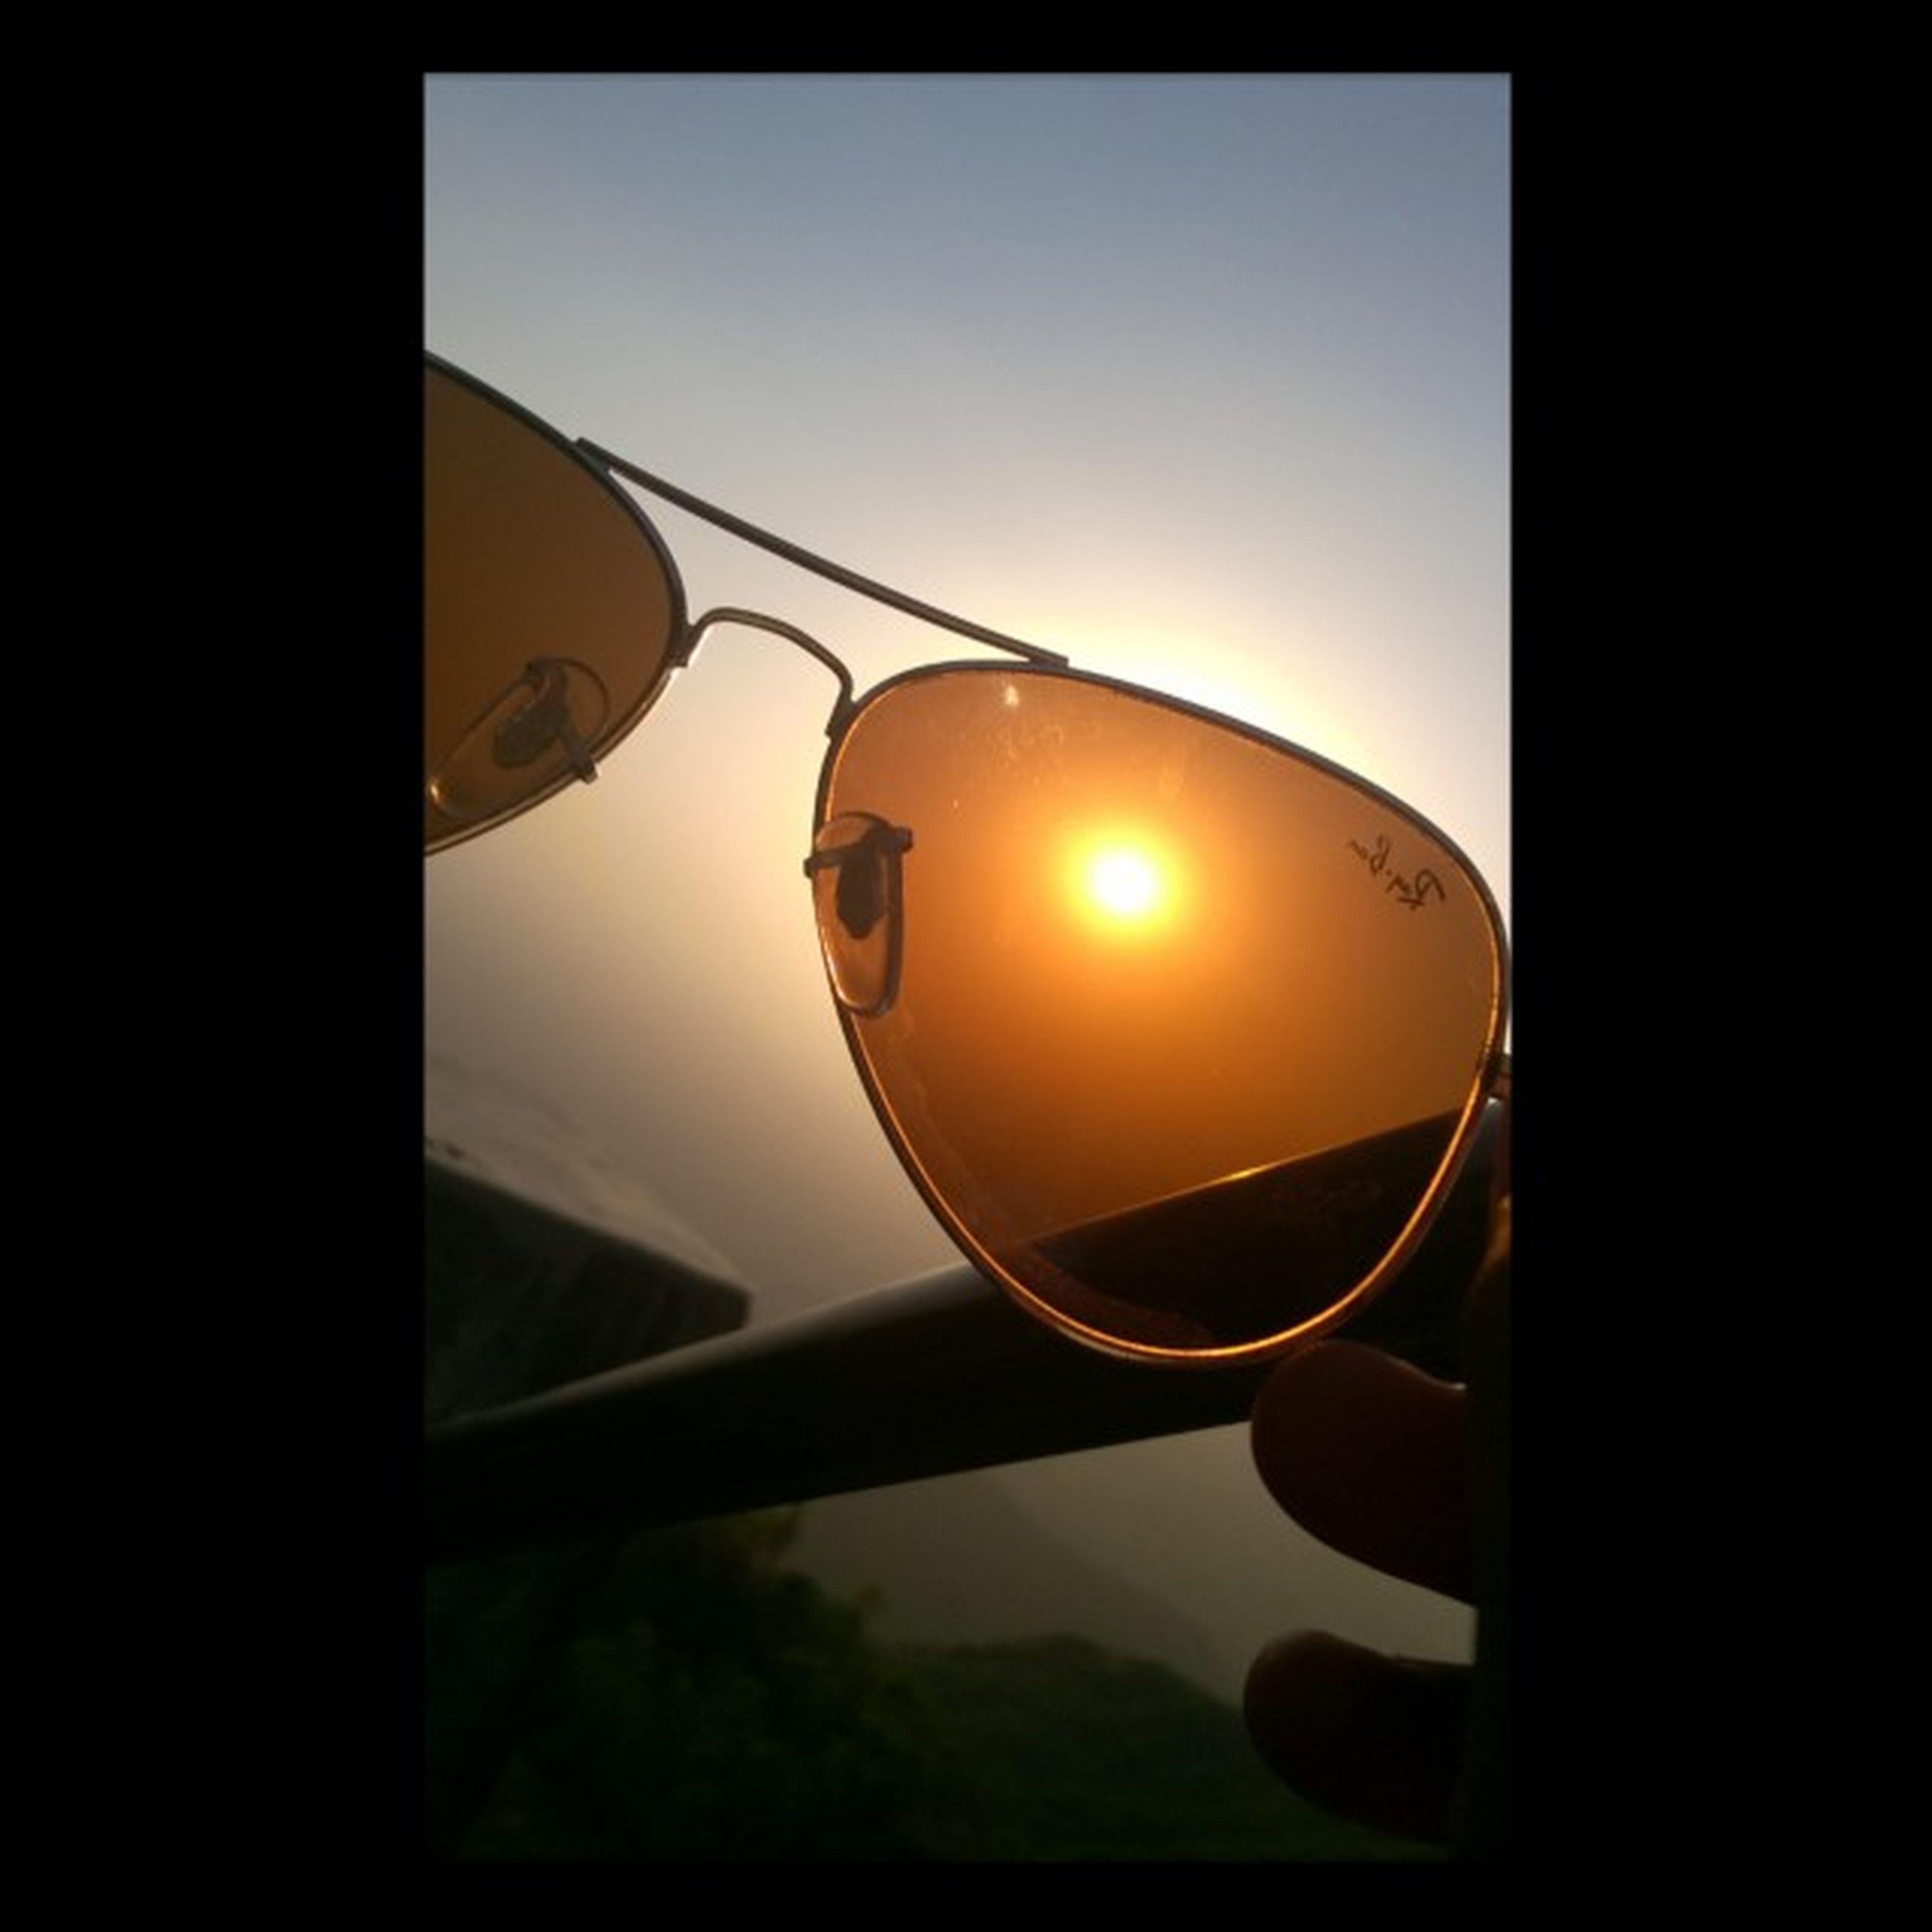 sunset, sun, silhouette, sky, glass - material, transparent, orange color, window, transportation, clear sky, reflection, close-up, lighting equipment, sunlight, nature, no people, transfer print, dark, indoors, street light